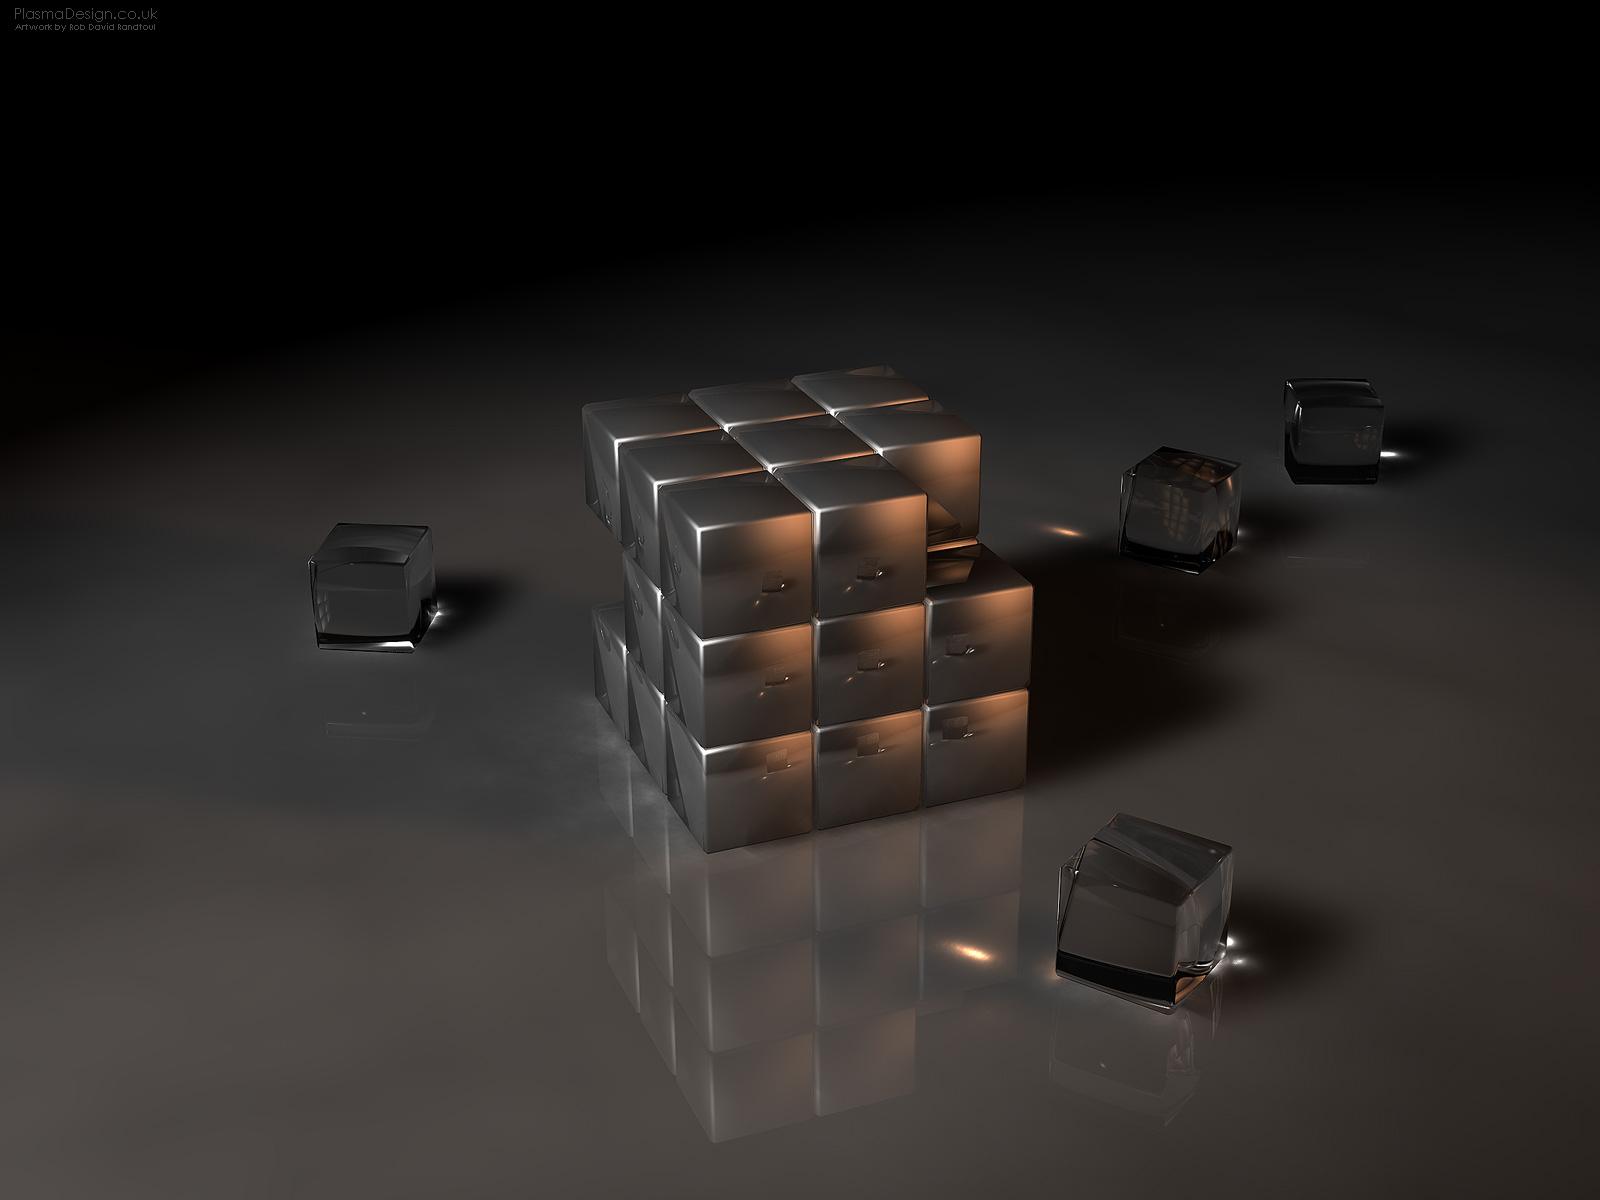 http://1.bp.blogspot.com/_9EVC1Jt2fJM/TR3-M0eiP6I/AAAAAAAAALk/gtCPCkgRkYE/s1600/wallpaper-cubos-hielo.jpg